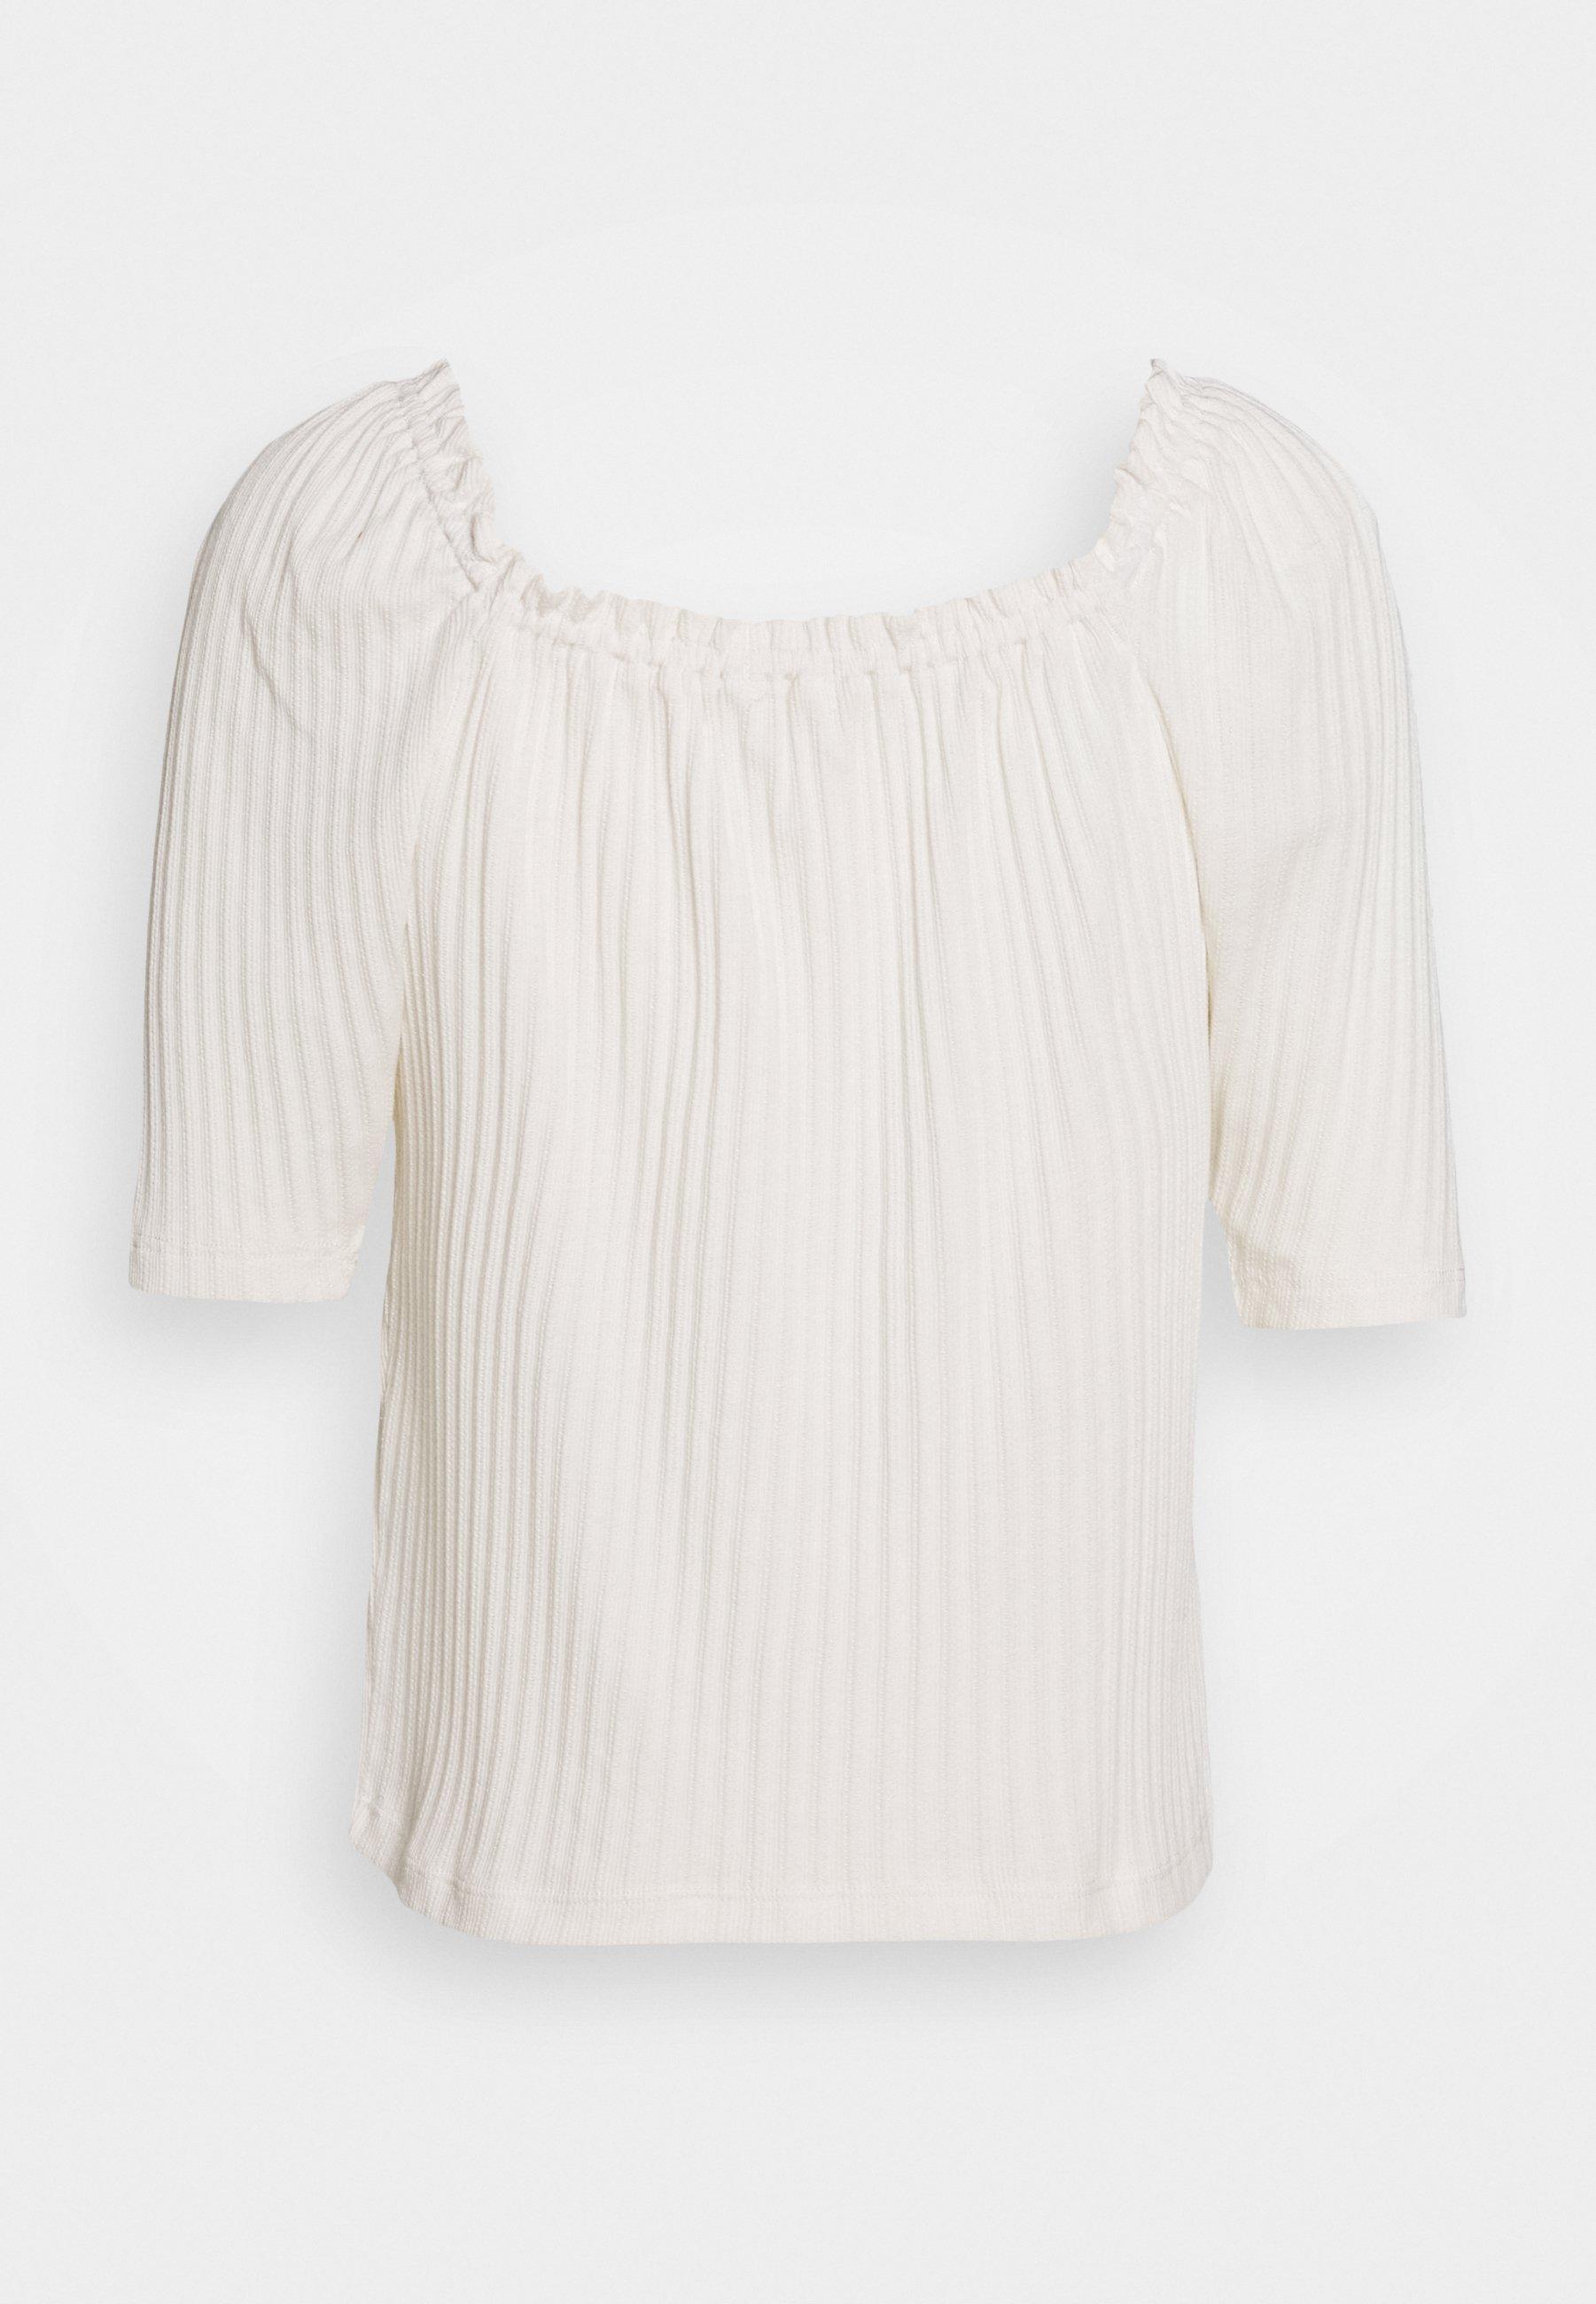 Madewell Café Cluny - T-shirt Print Pearl Ivory UpyDjotf PA